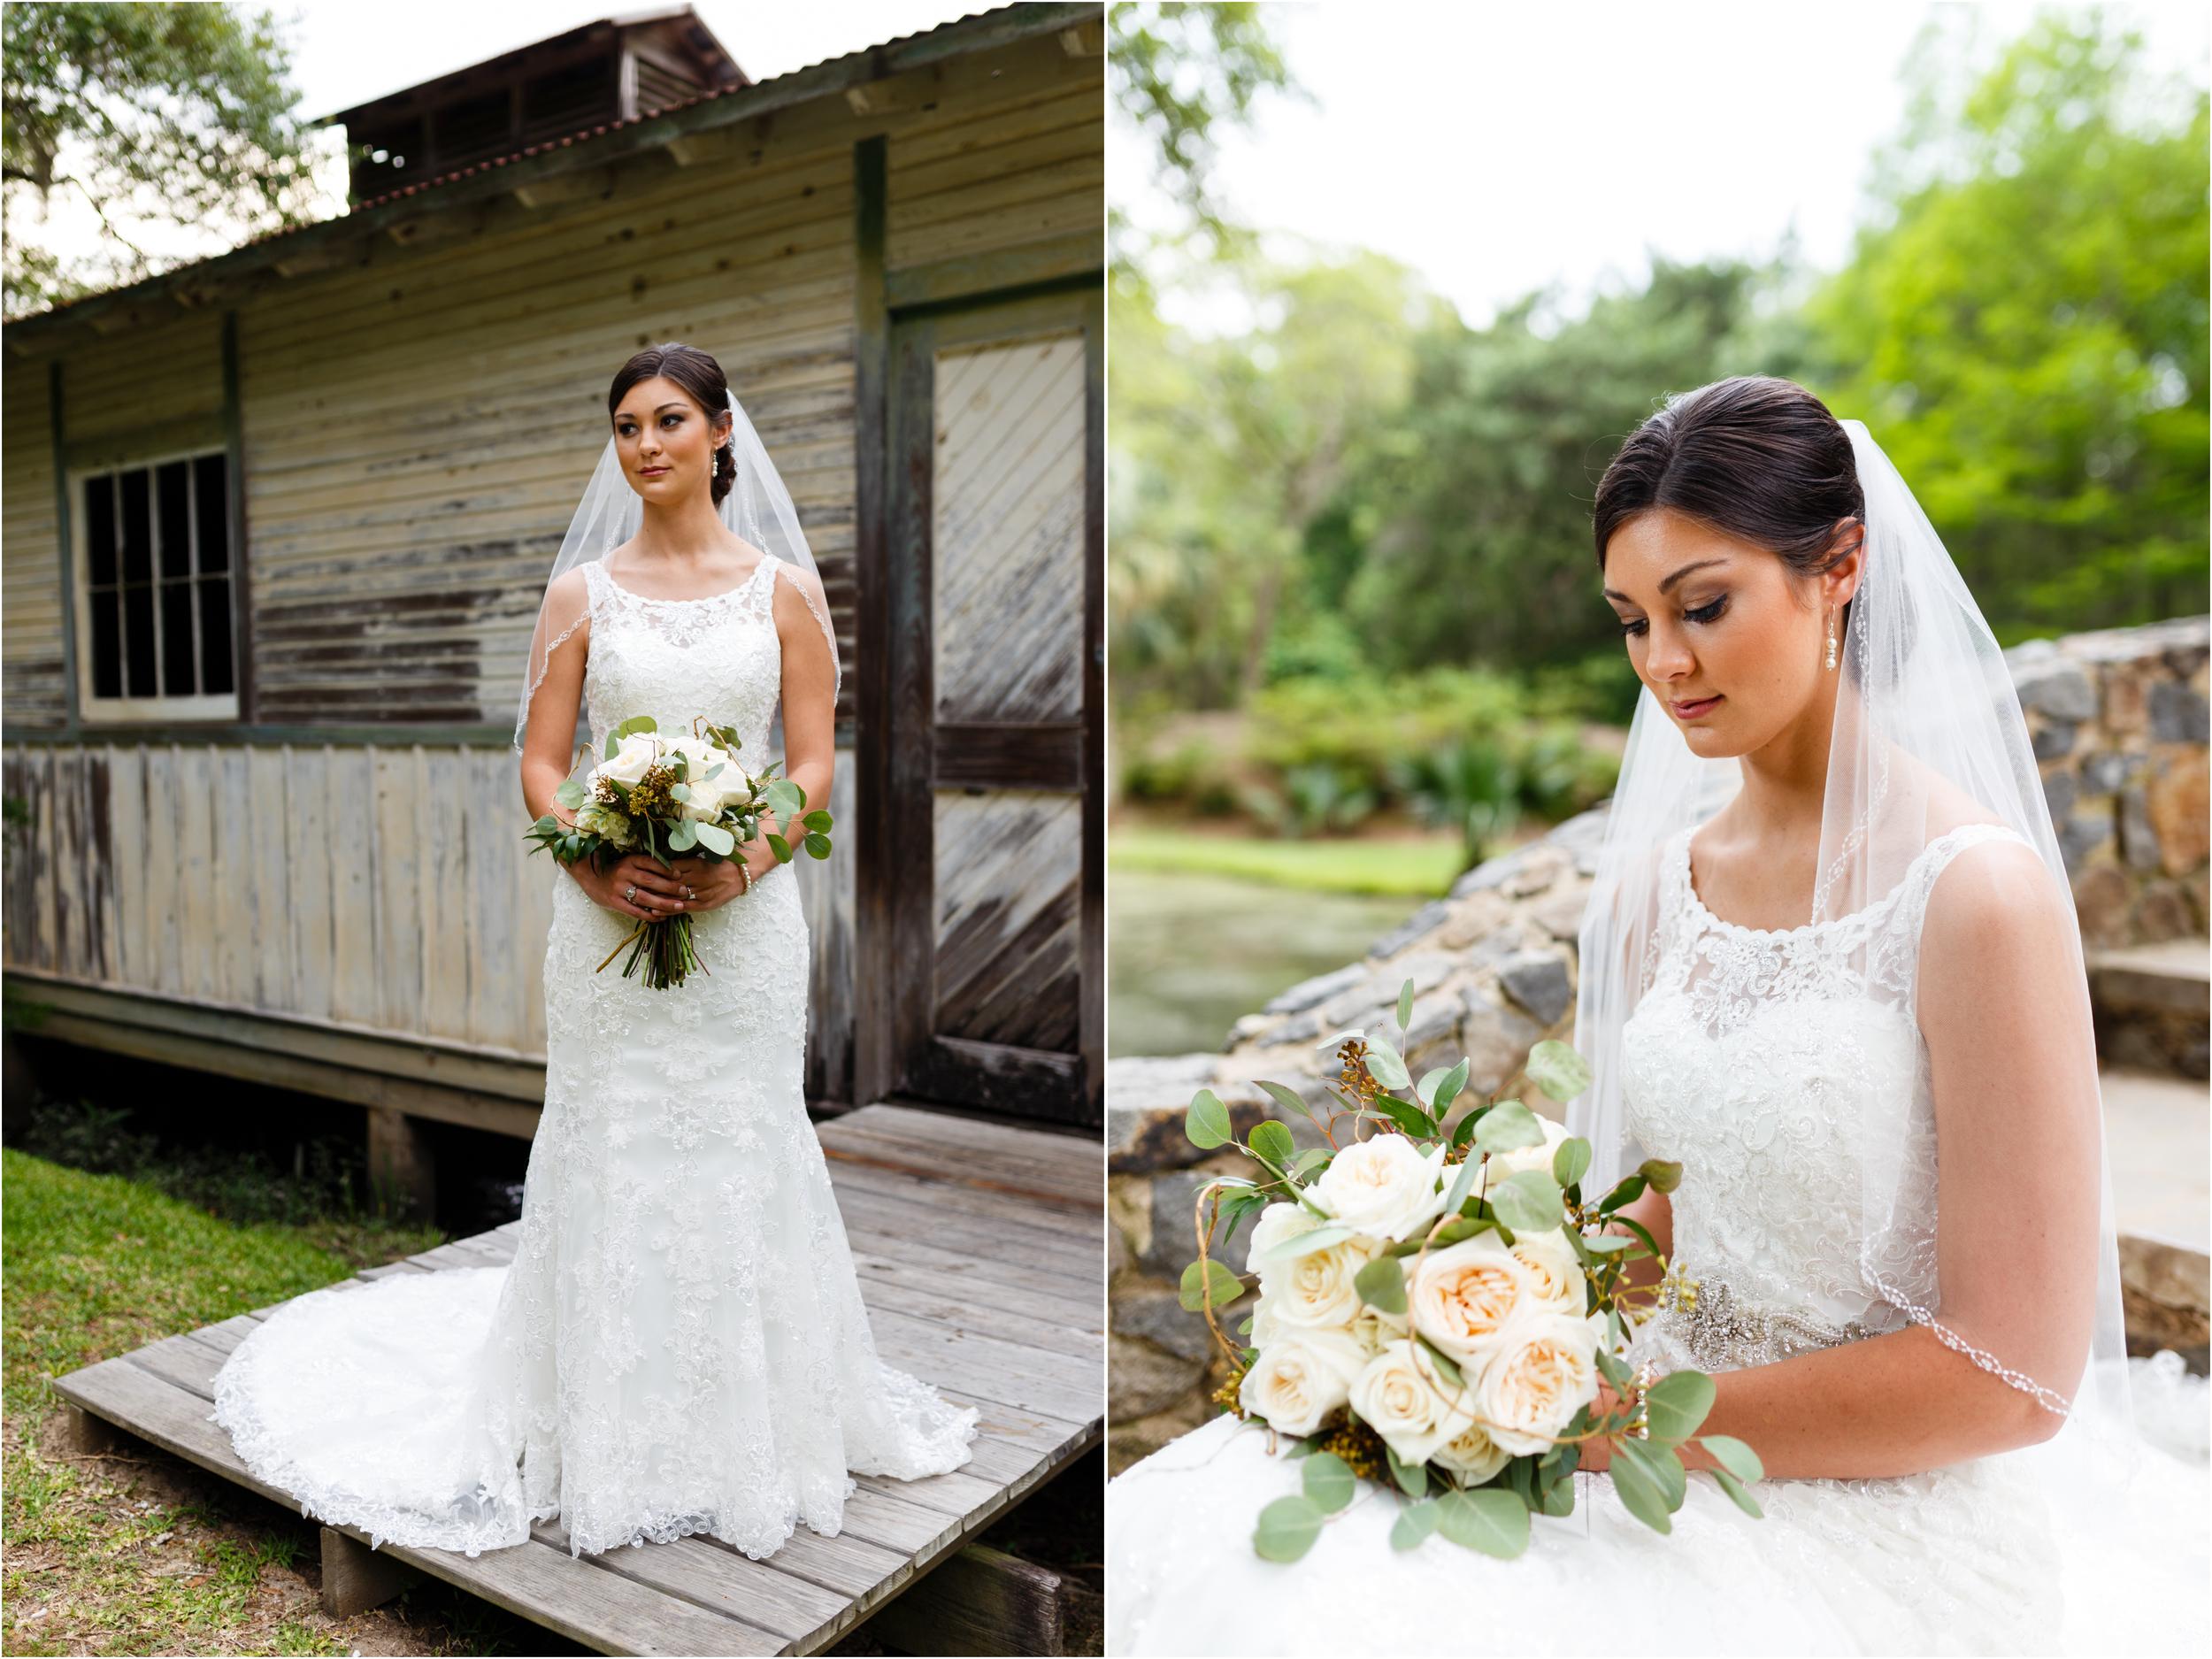 Bridal-wedding-portrait-lafayette-broussard-youngsville-photographer-6 (4).jpg